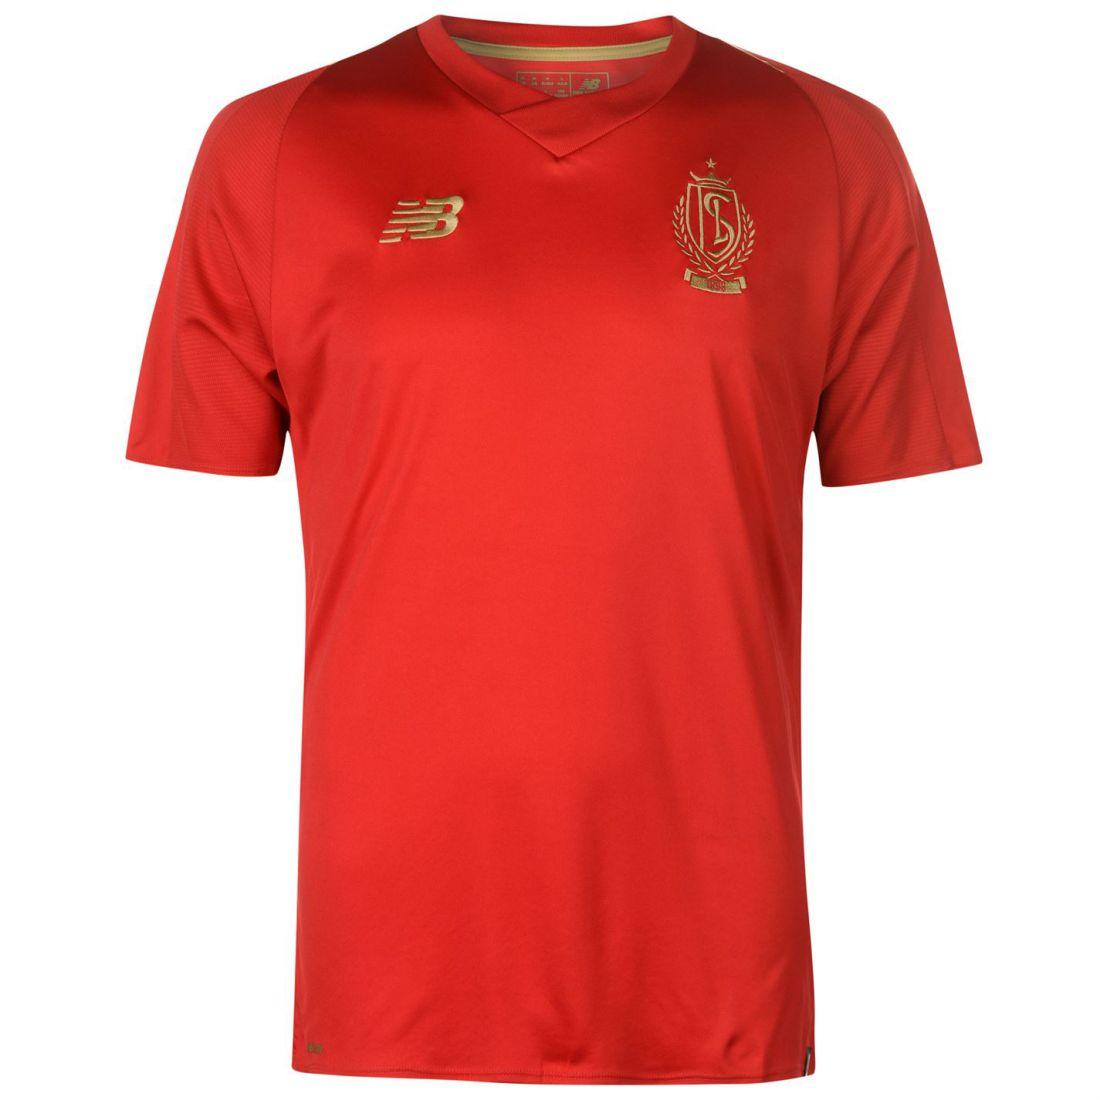 New Balance Mens Standard Liege Home Jersey 2018 2019 Domestic Shirt ... 05f31dd93